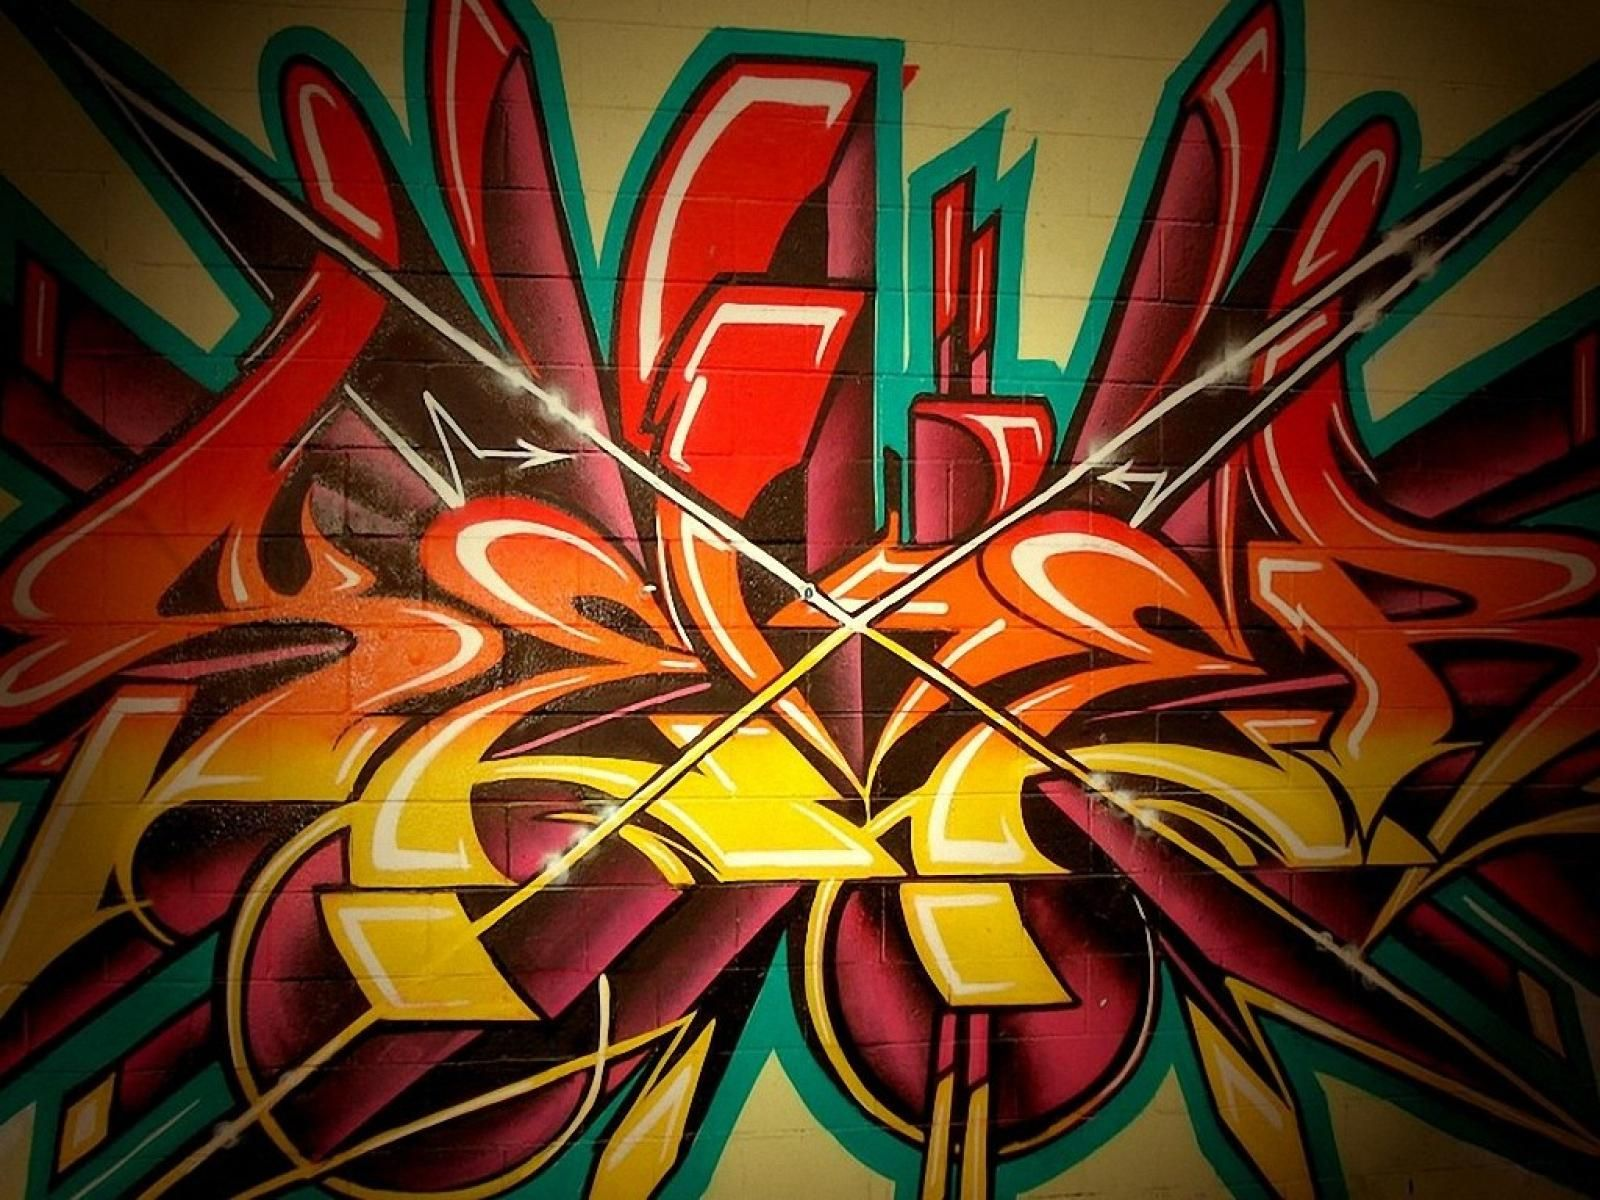 Colourful graffiti backgrounds wallpaperpulse free wallpapers graffiti colourful graffiti backgrounds wallpaperpulse voltagebd Image collections